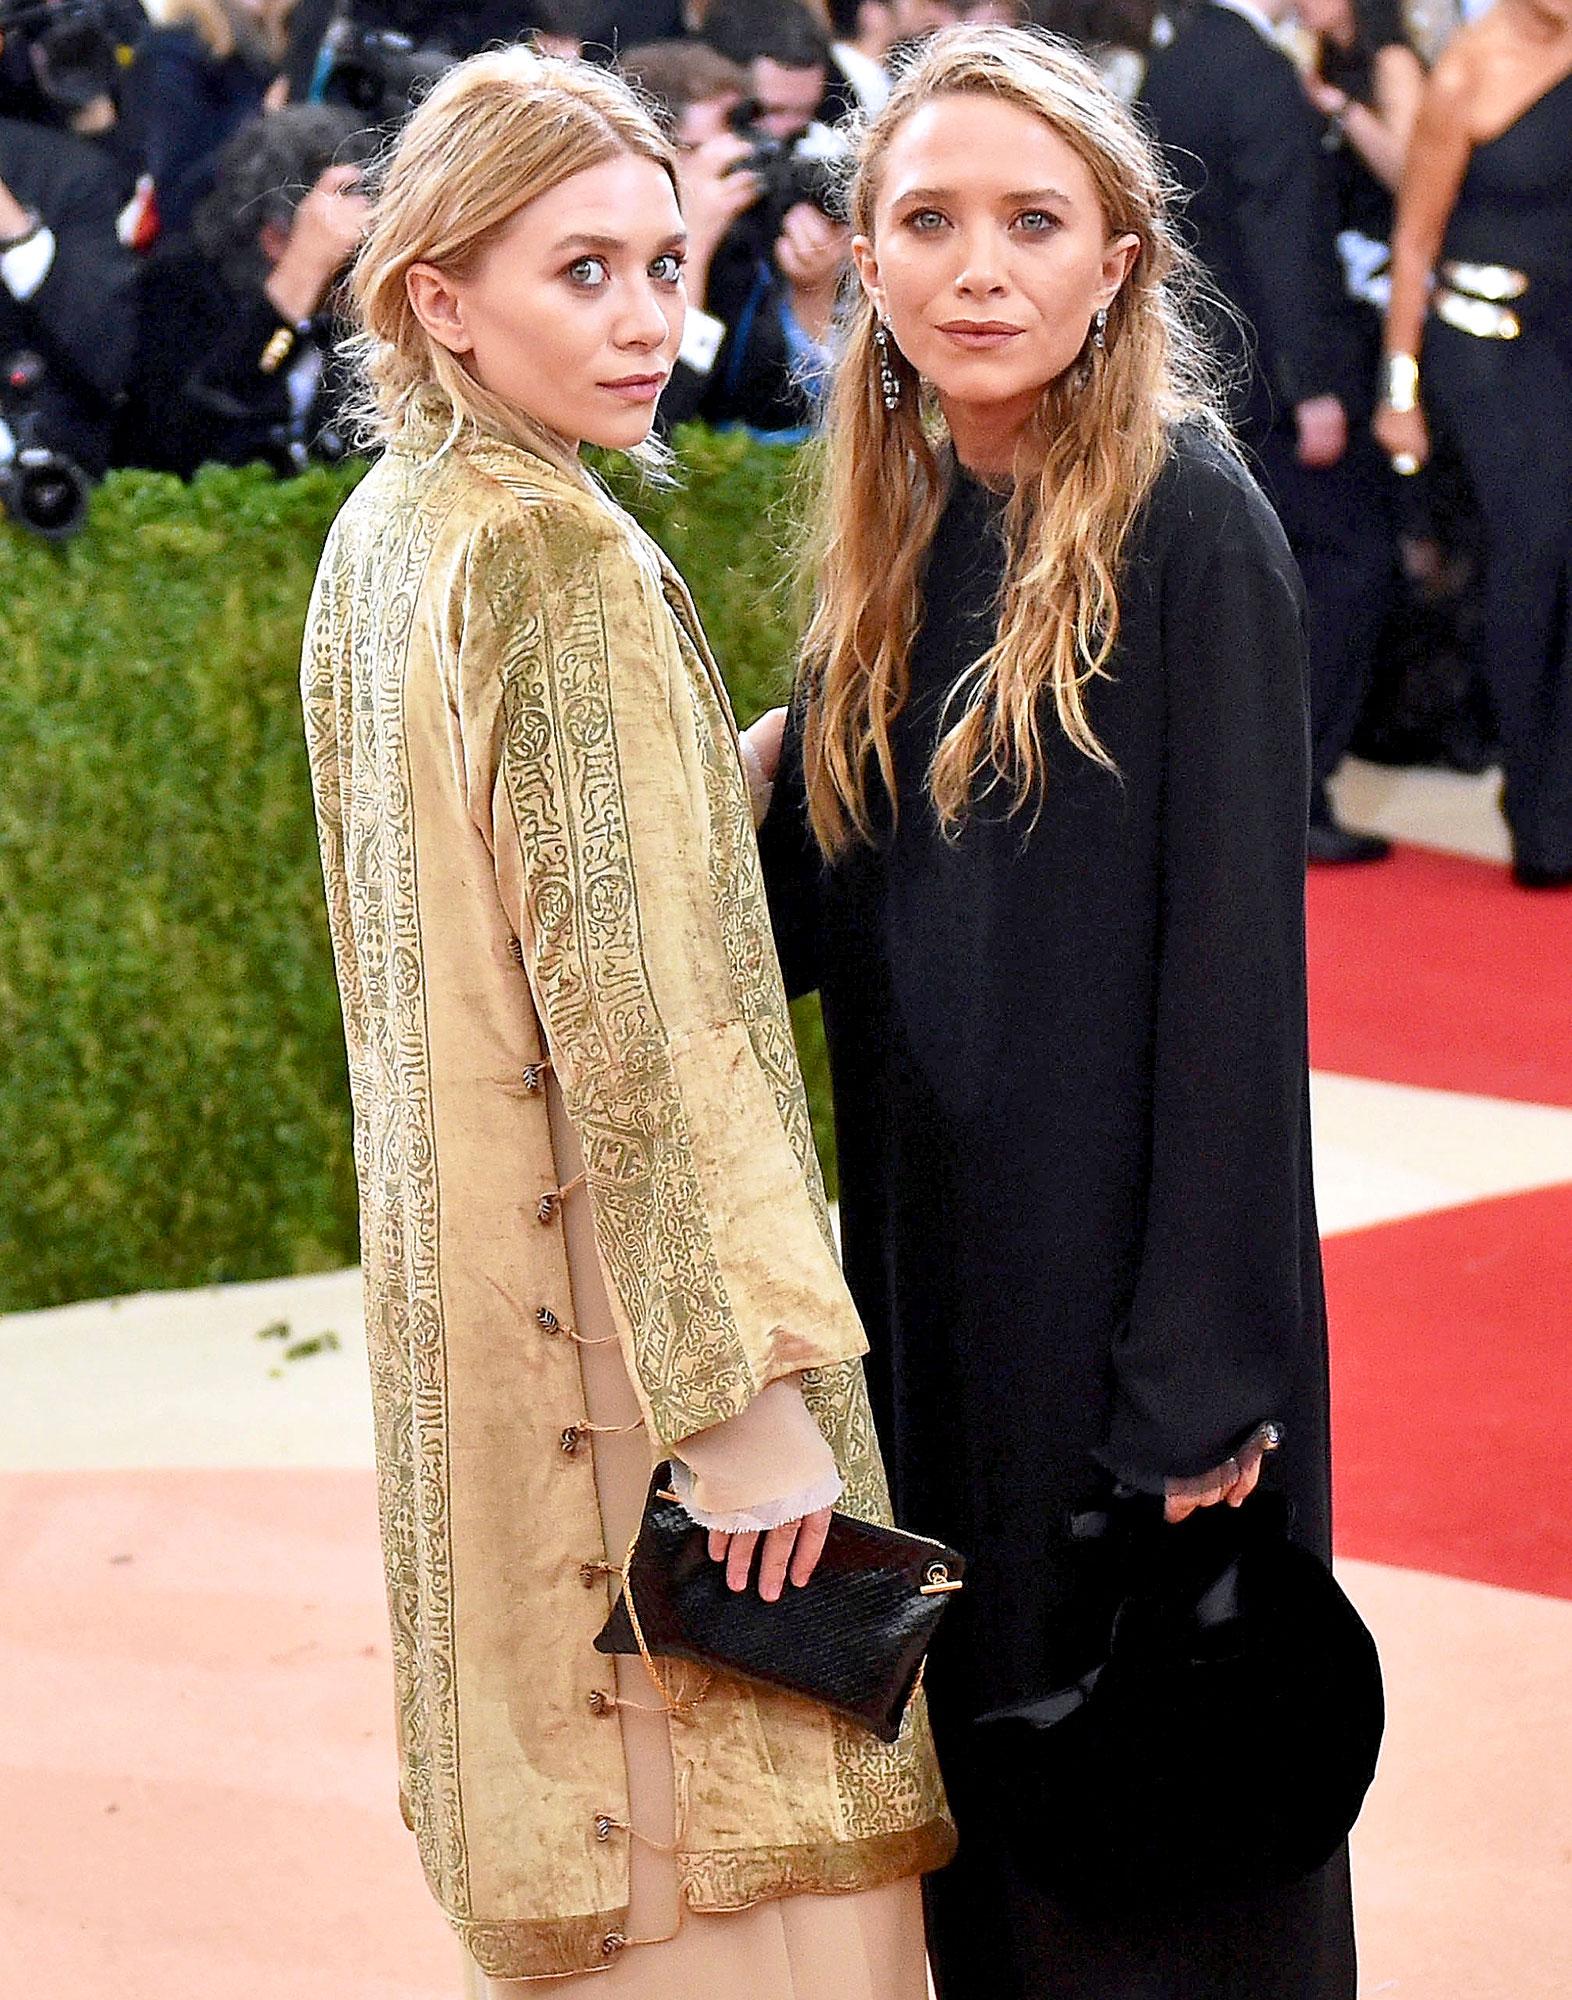 30-year-old Ashley Olsen after her sister chose an elderly boyfriend